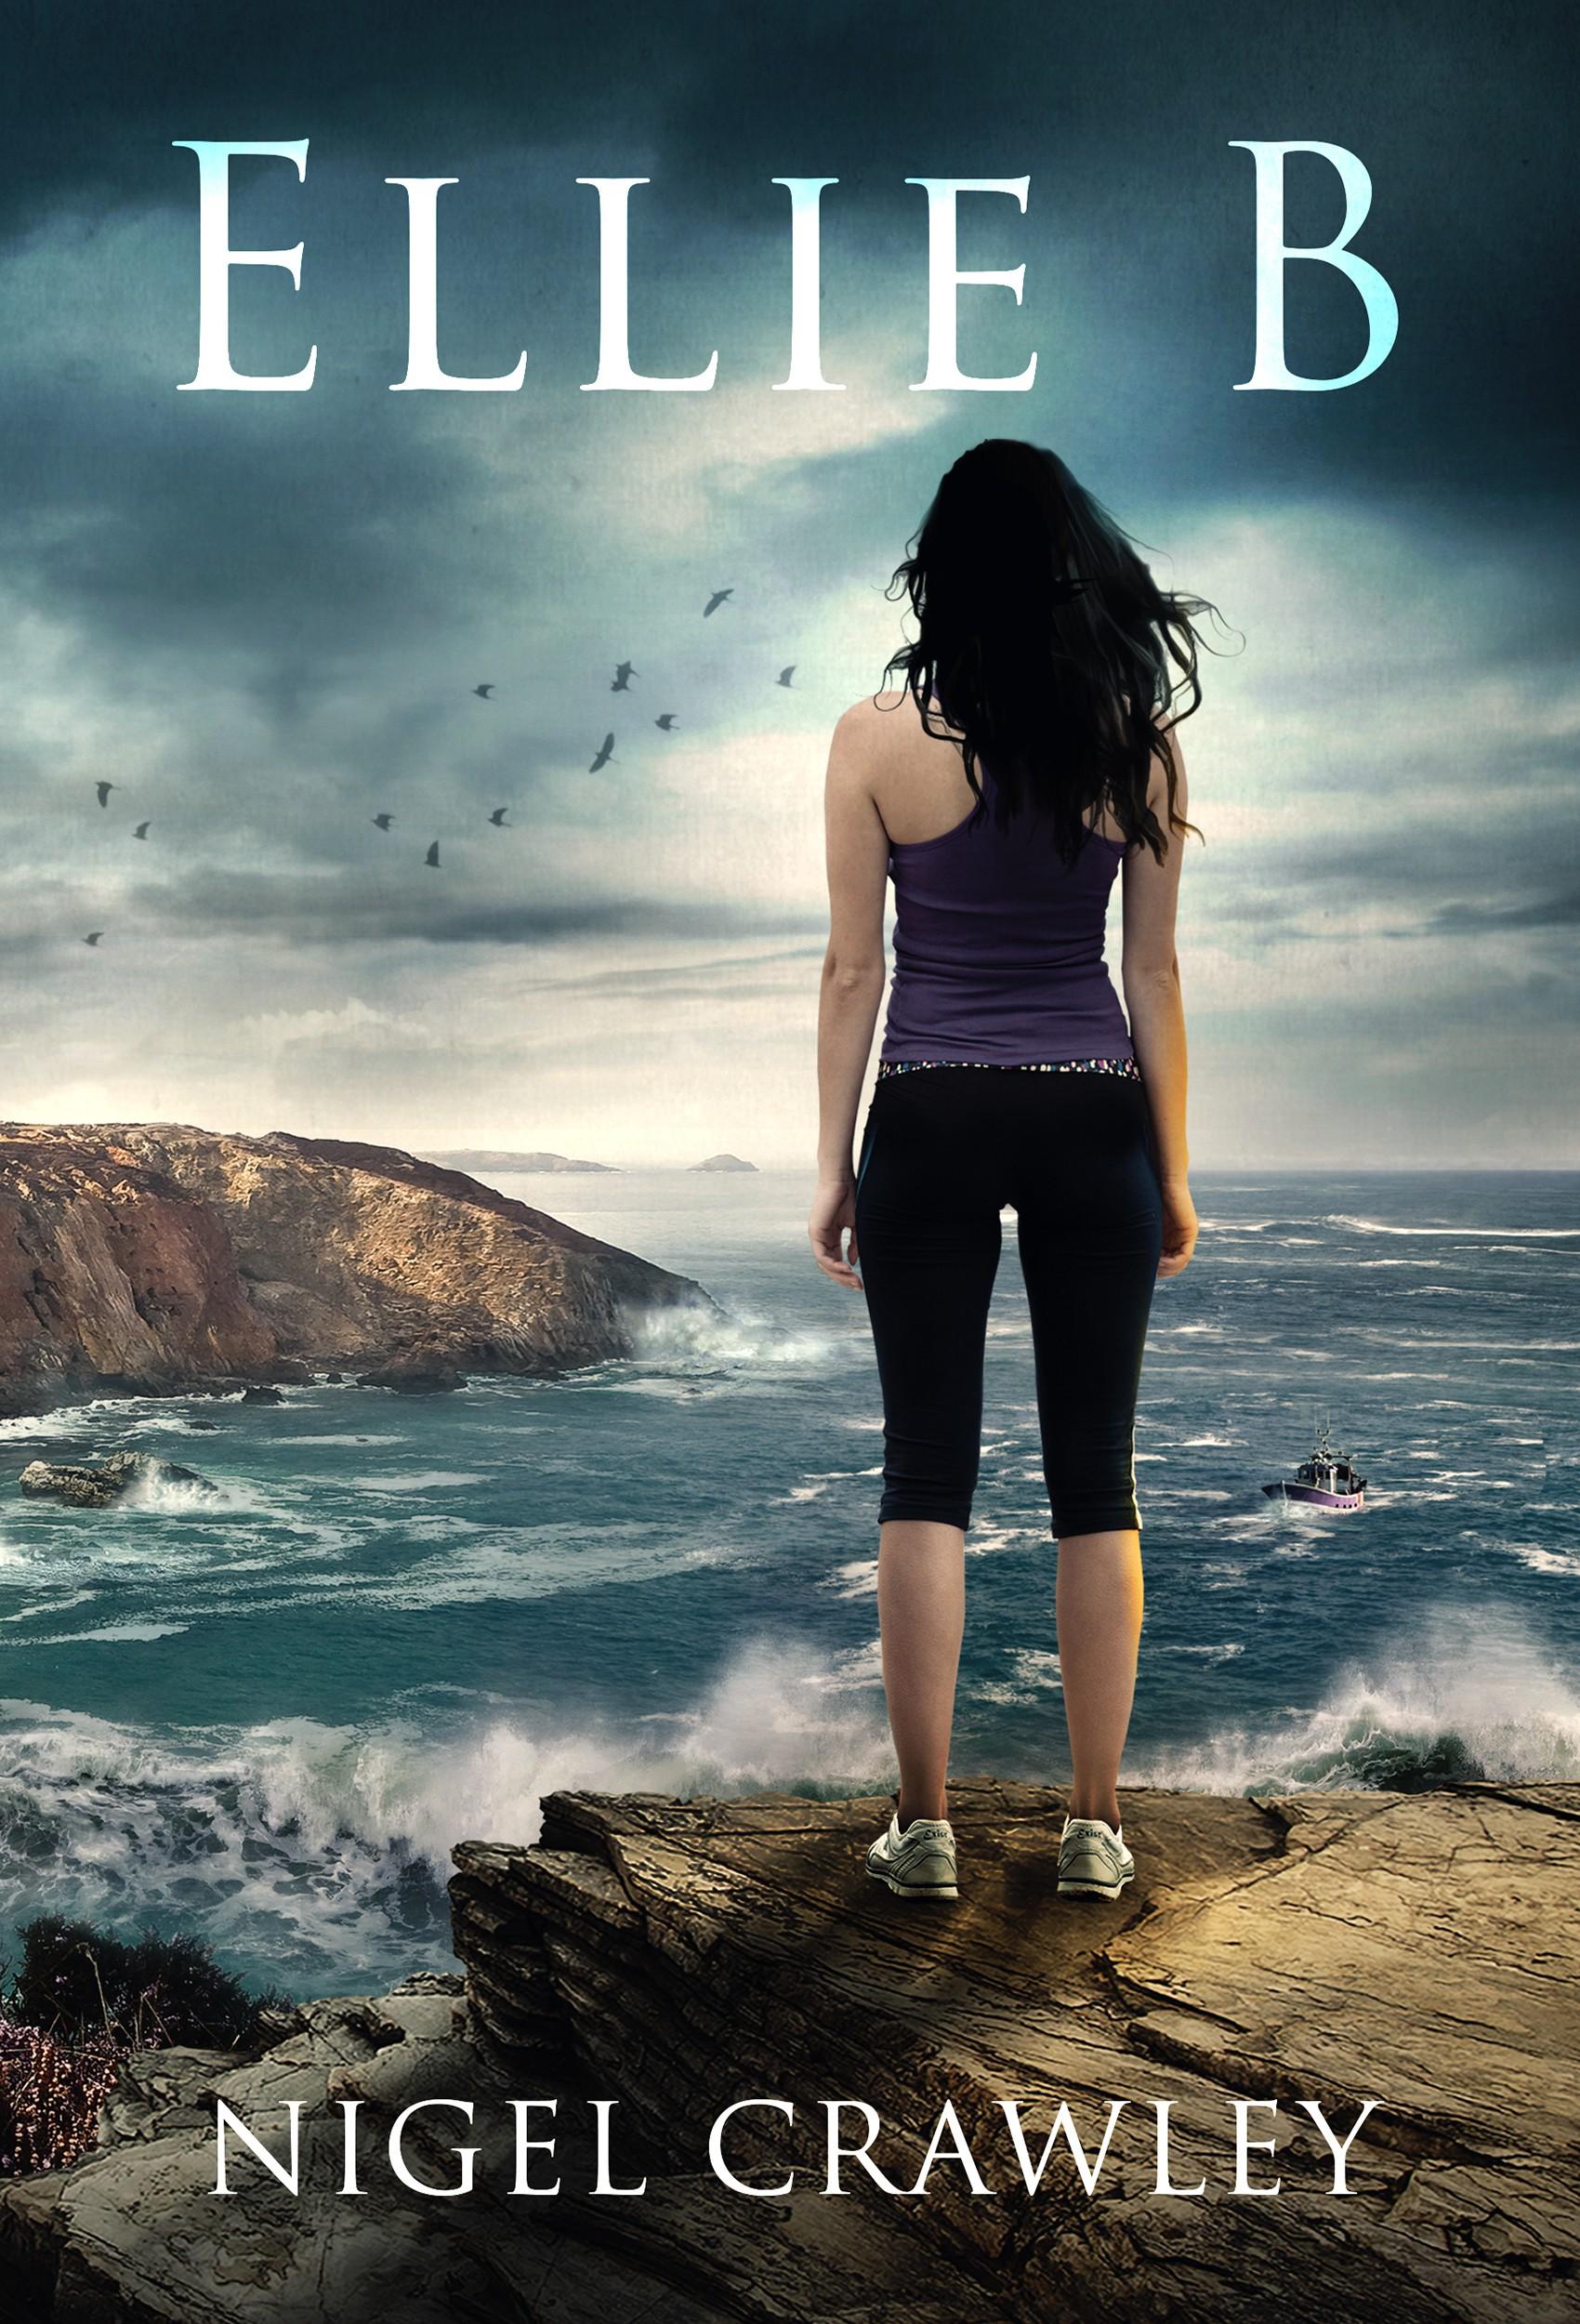 Book cover design for my new novel Ellie B